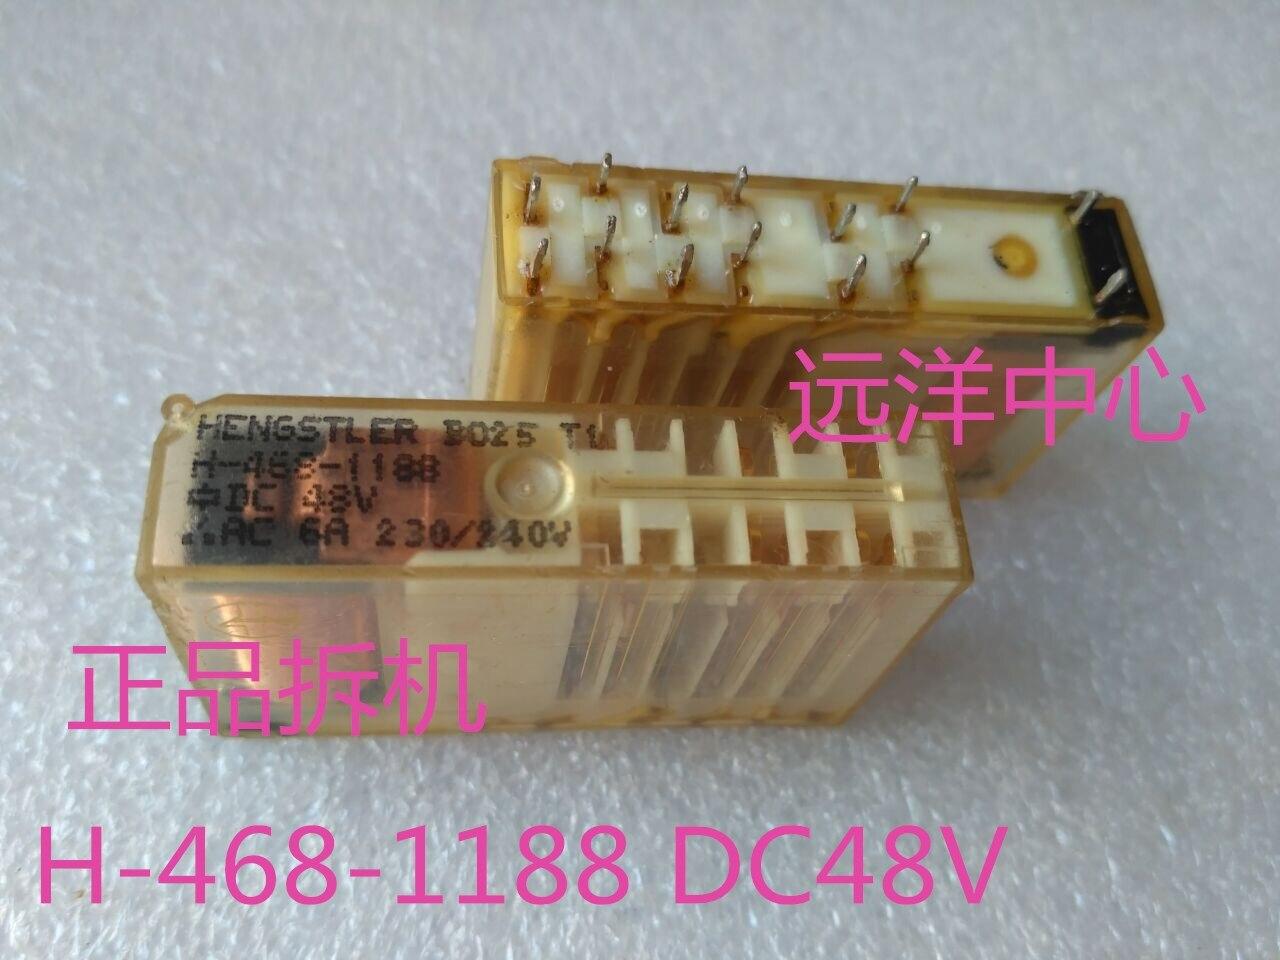 цена на H-468-1188 DC48V   6A 14